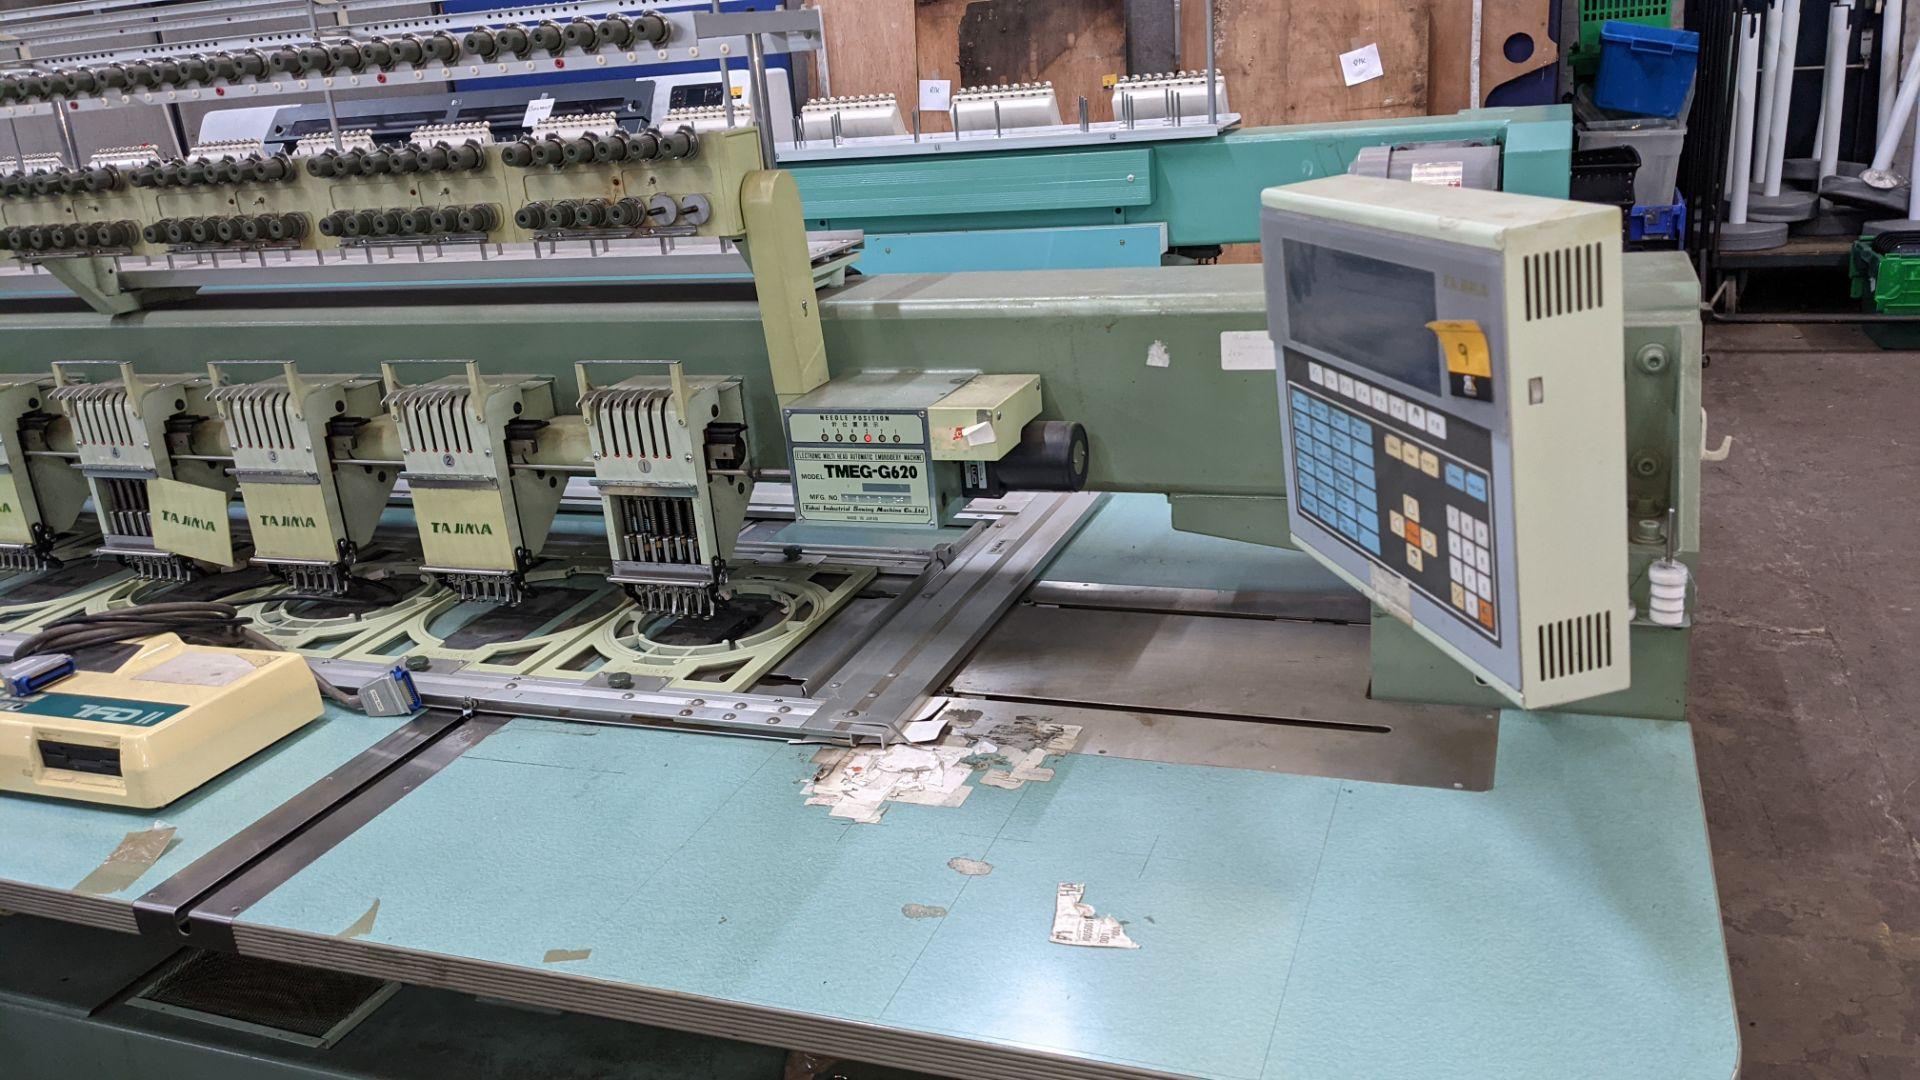 Tokai Tajima electronic 20 head automatic embroidery machine model TMEG-G620, manufacturing number 7 - Image 3 of 19